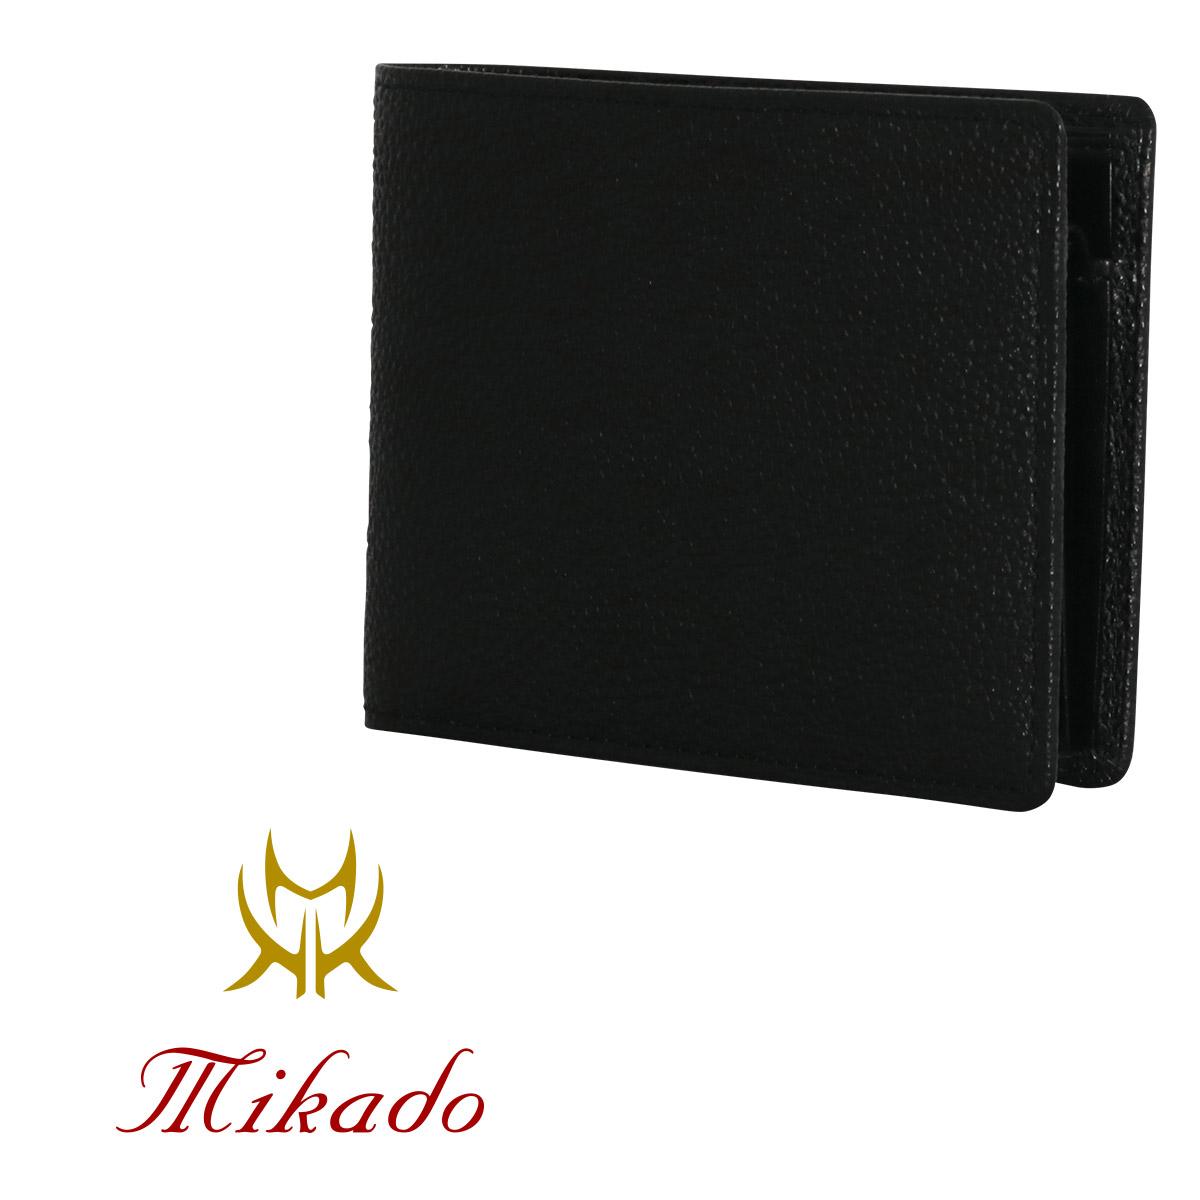 Mikado 二つ折り財布 メンズ 黒桟革 日本製 530017 ミカド レザー [PO5][bef][即日発送]